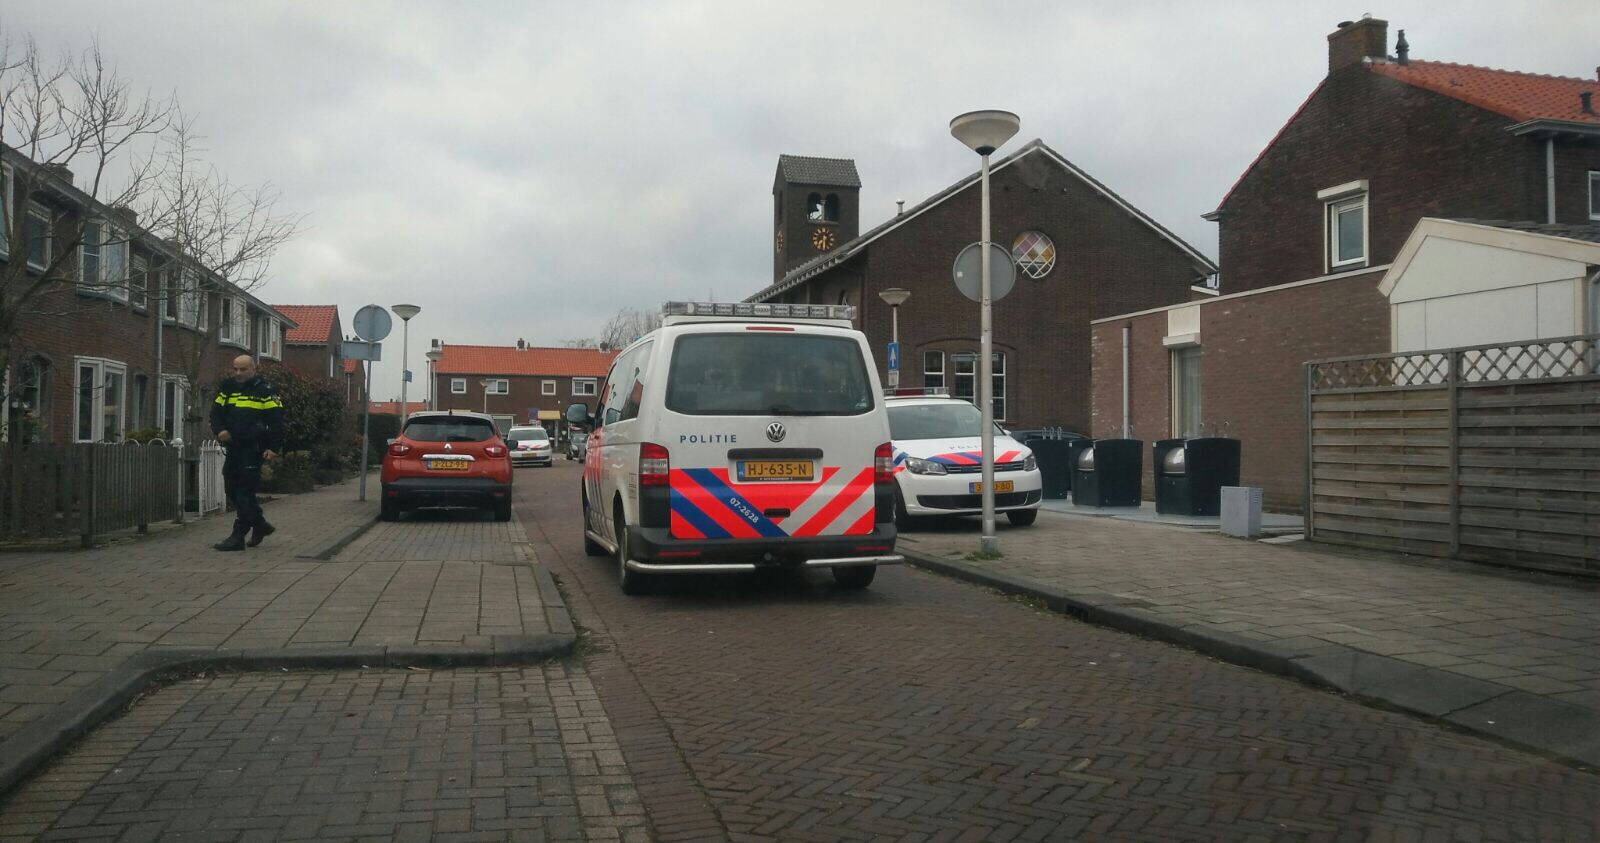 Klopjacht op verdachte na verkeersruzie in Capelle 's-Gravenland